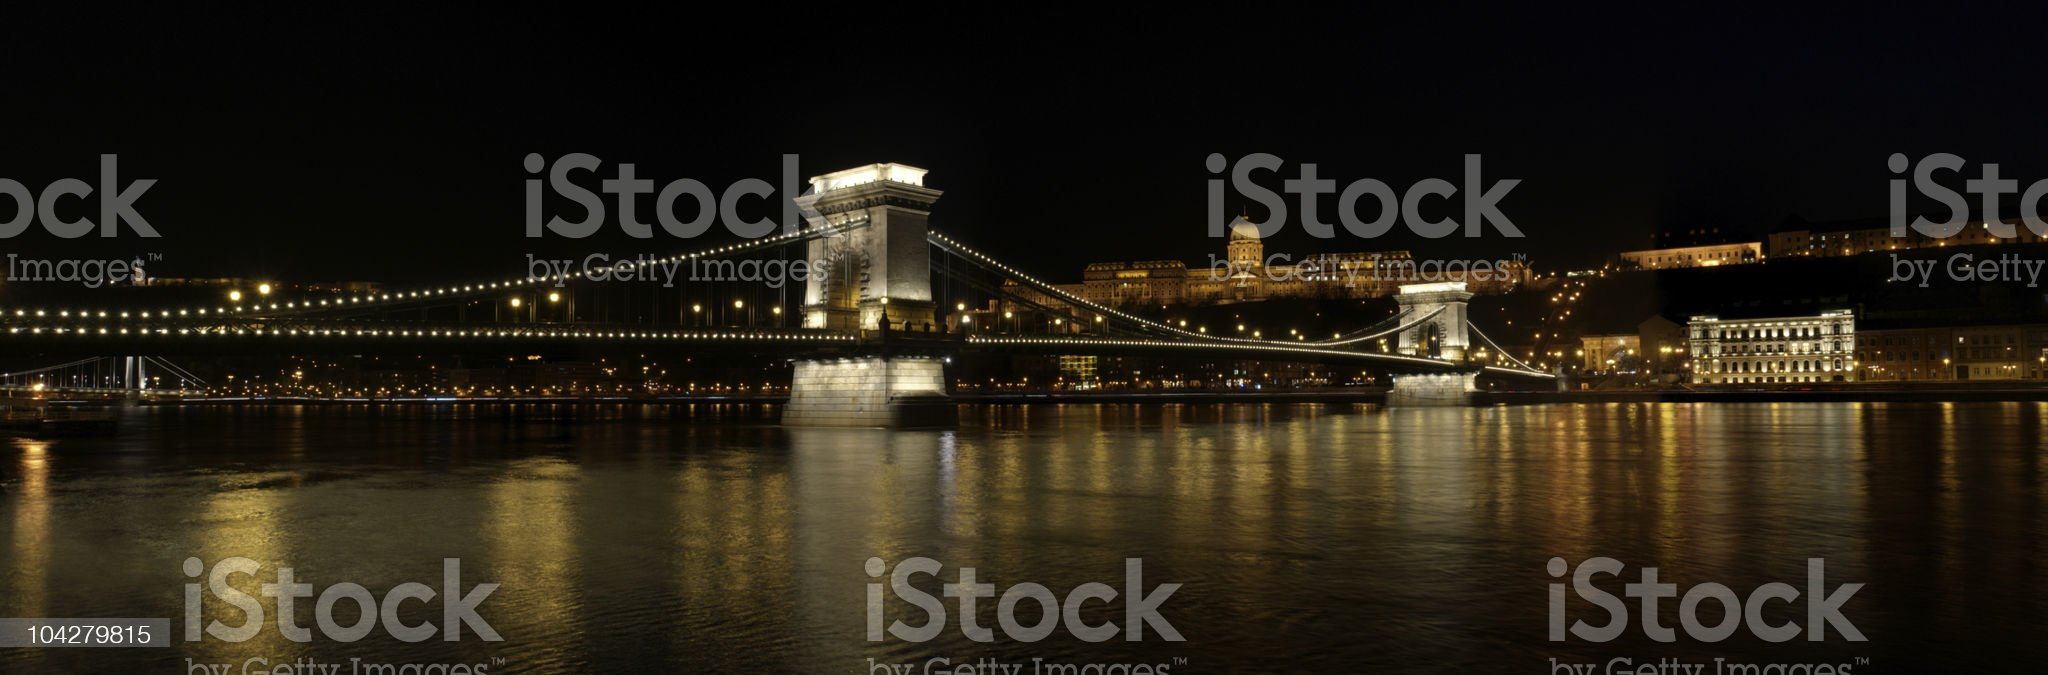 Chain Bridge and Royal palace royalty-free stock photo